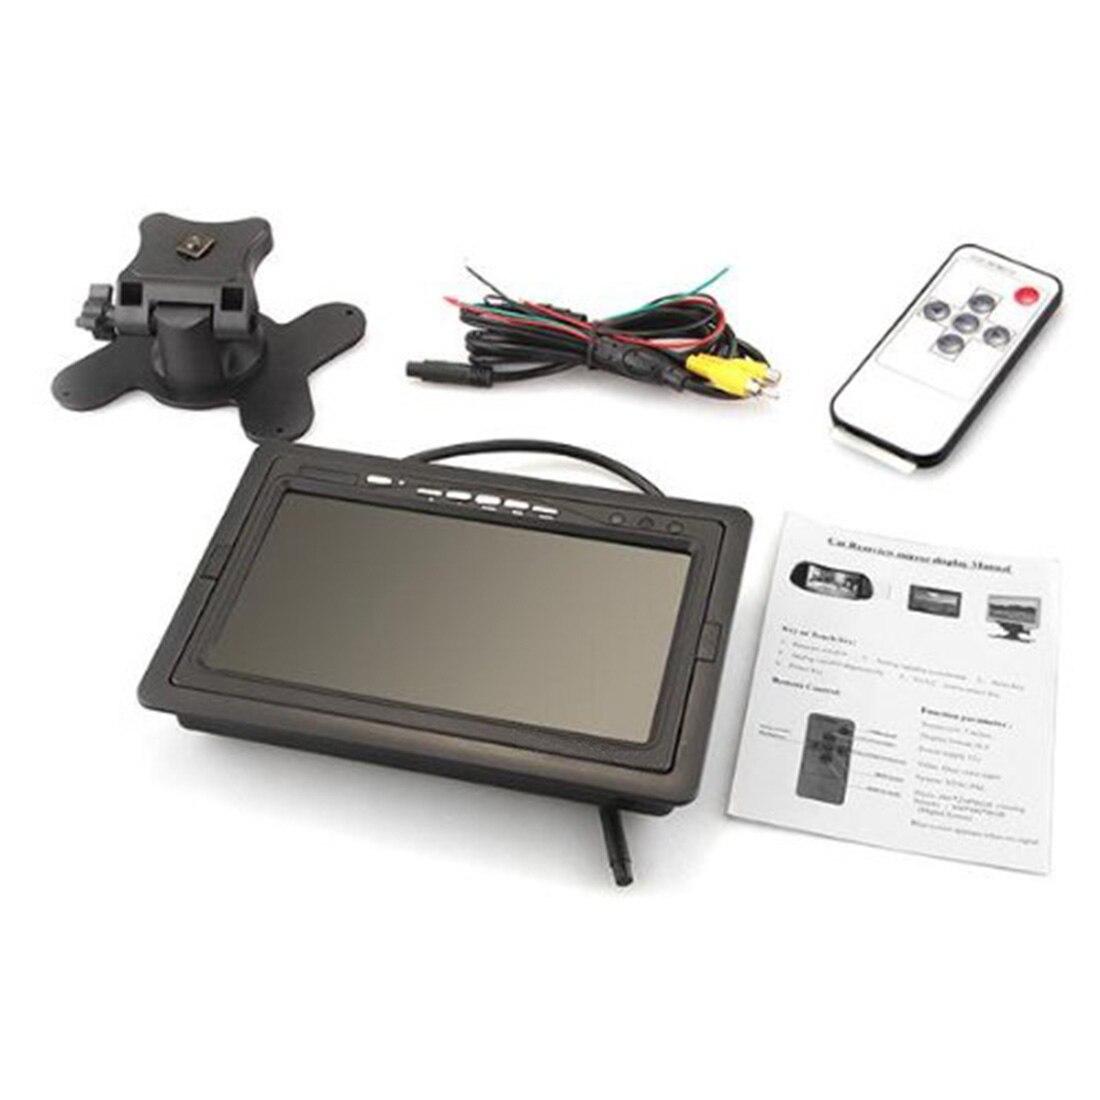 Marsnaska 2015 Hot Selling LCD Digital Color Screen Car Monitor For Backup Rear View Camera 7inch Brand New